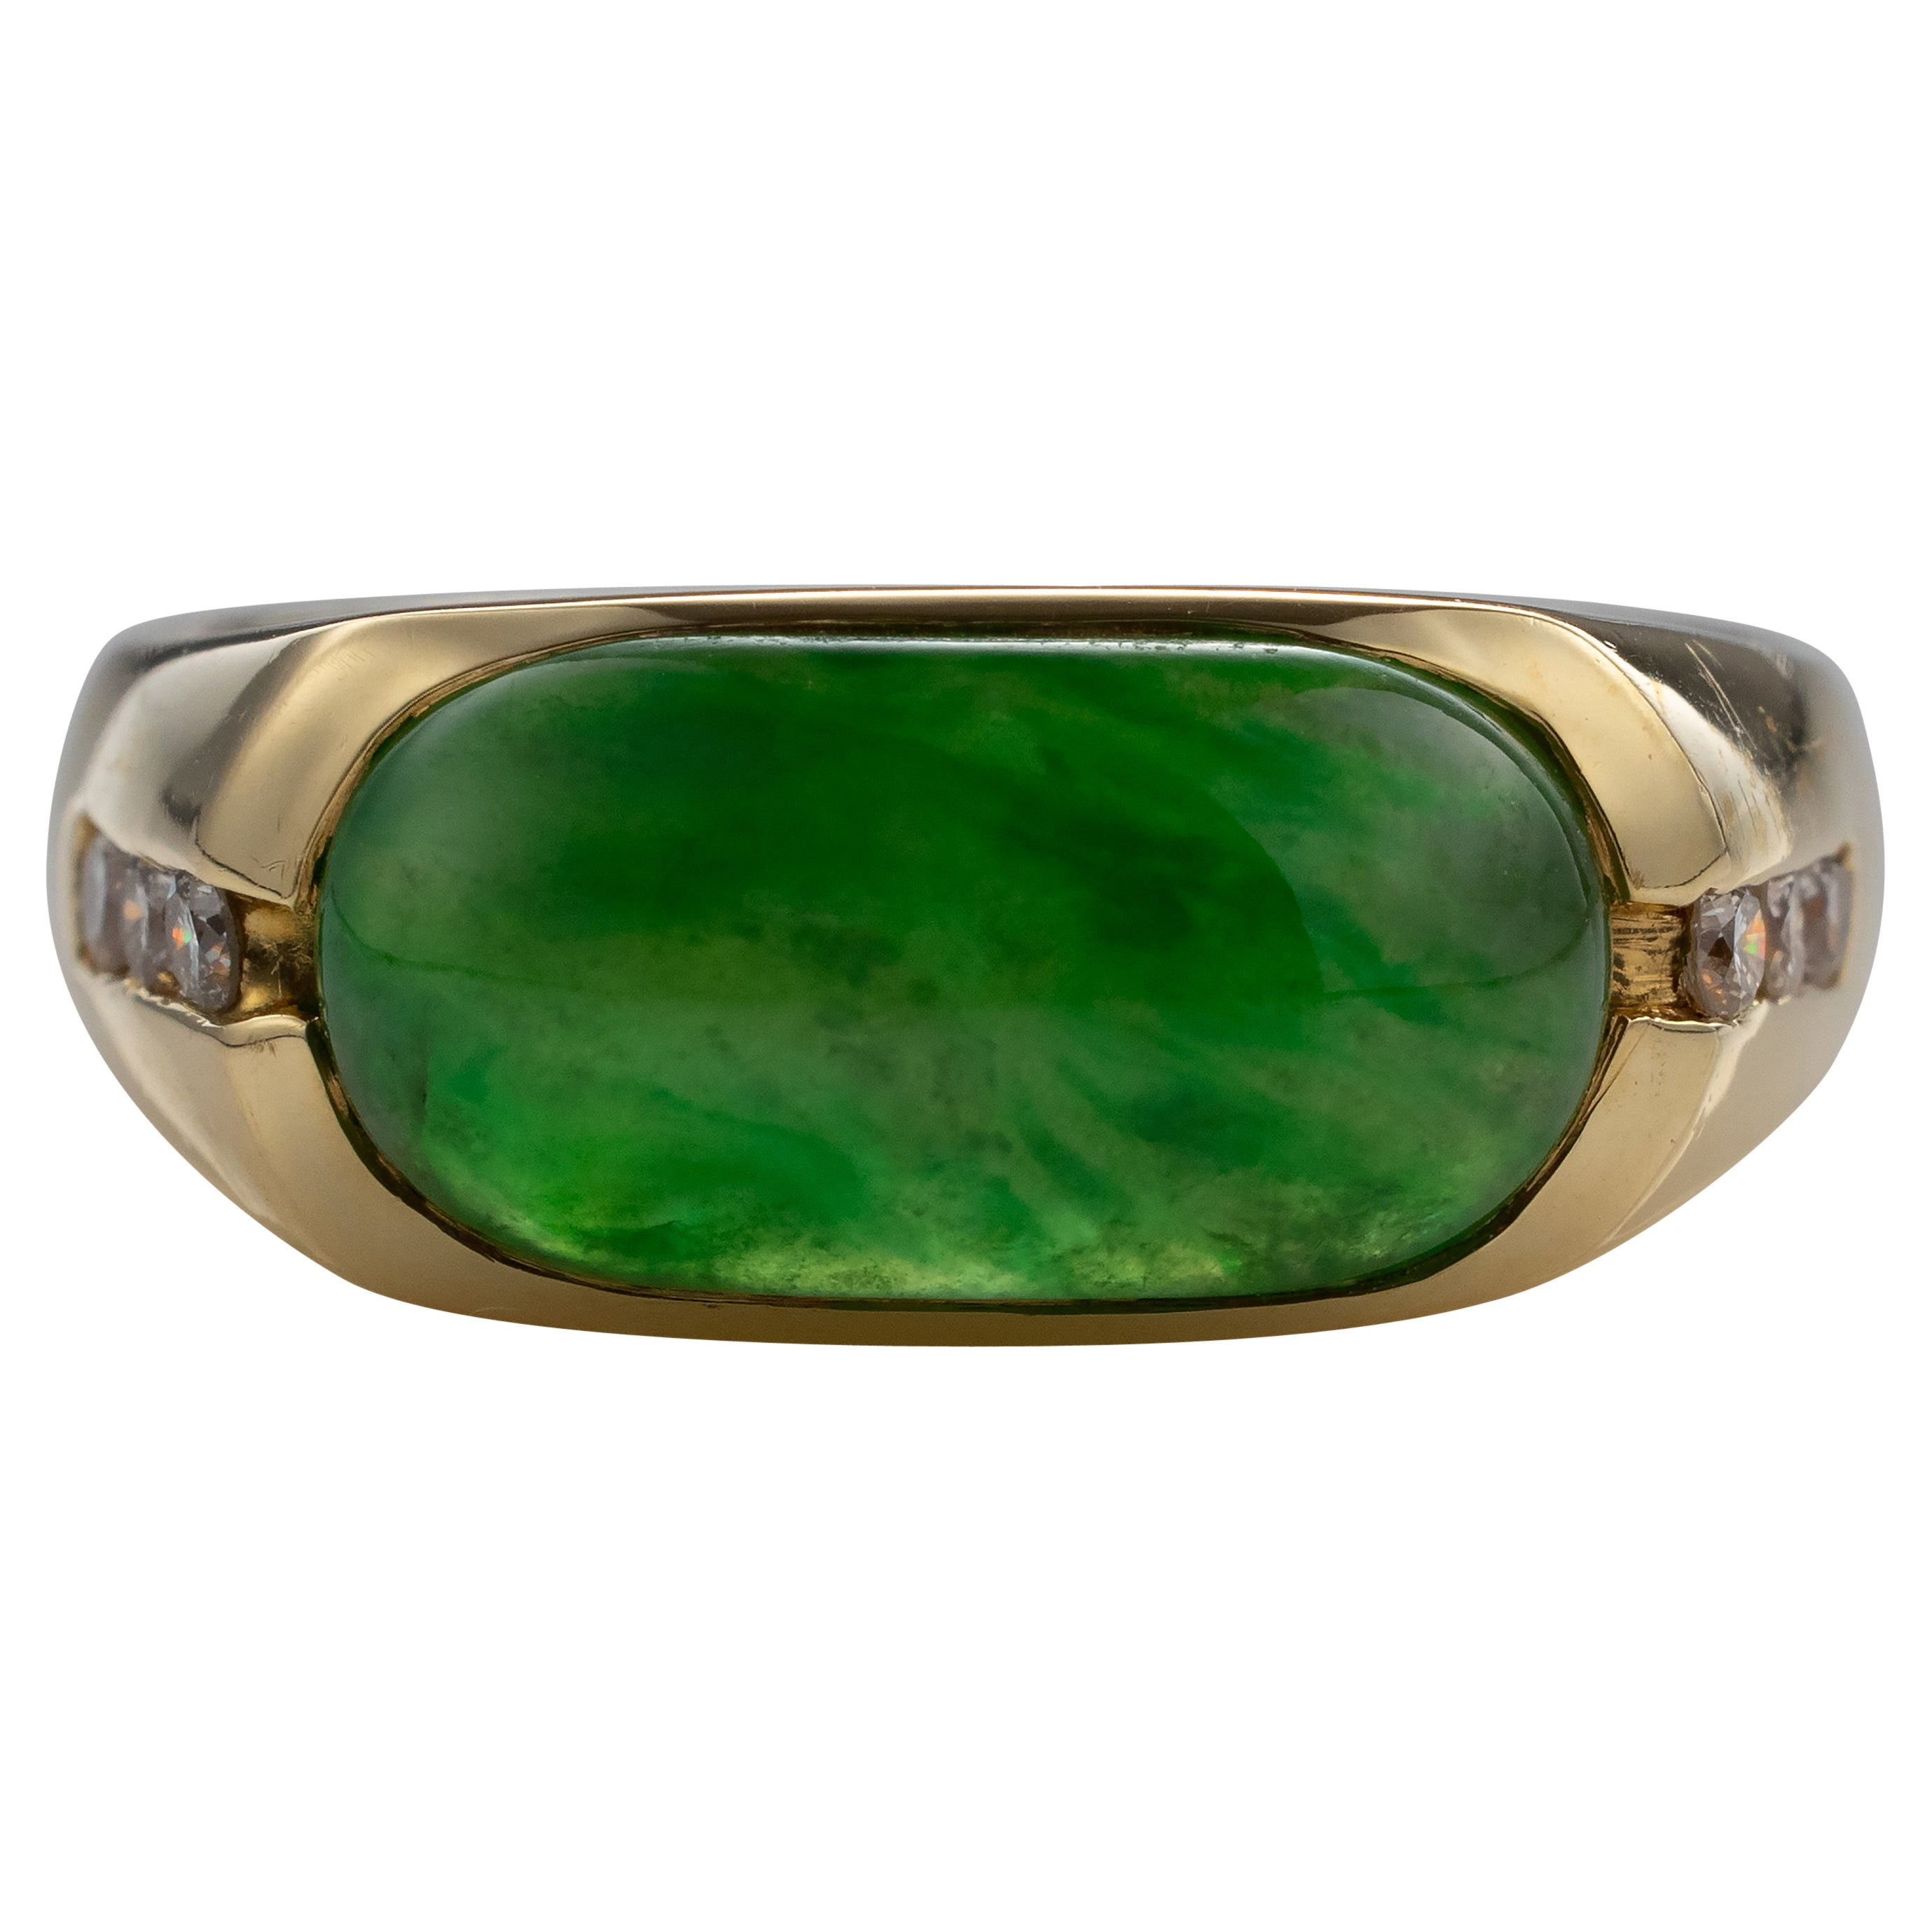 Jadeite Jade Ring with Diamonds Certified Untreated Emerald Green